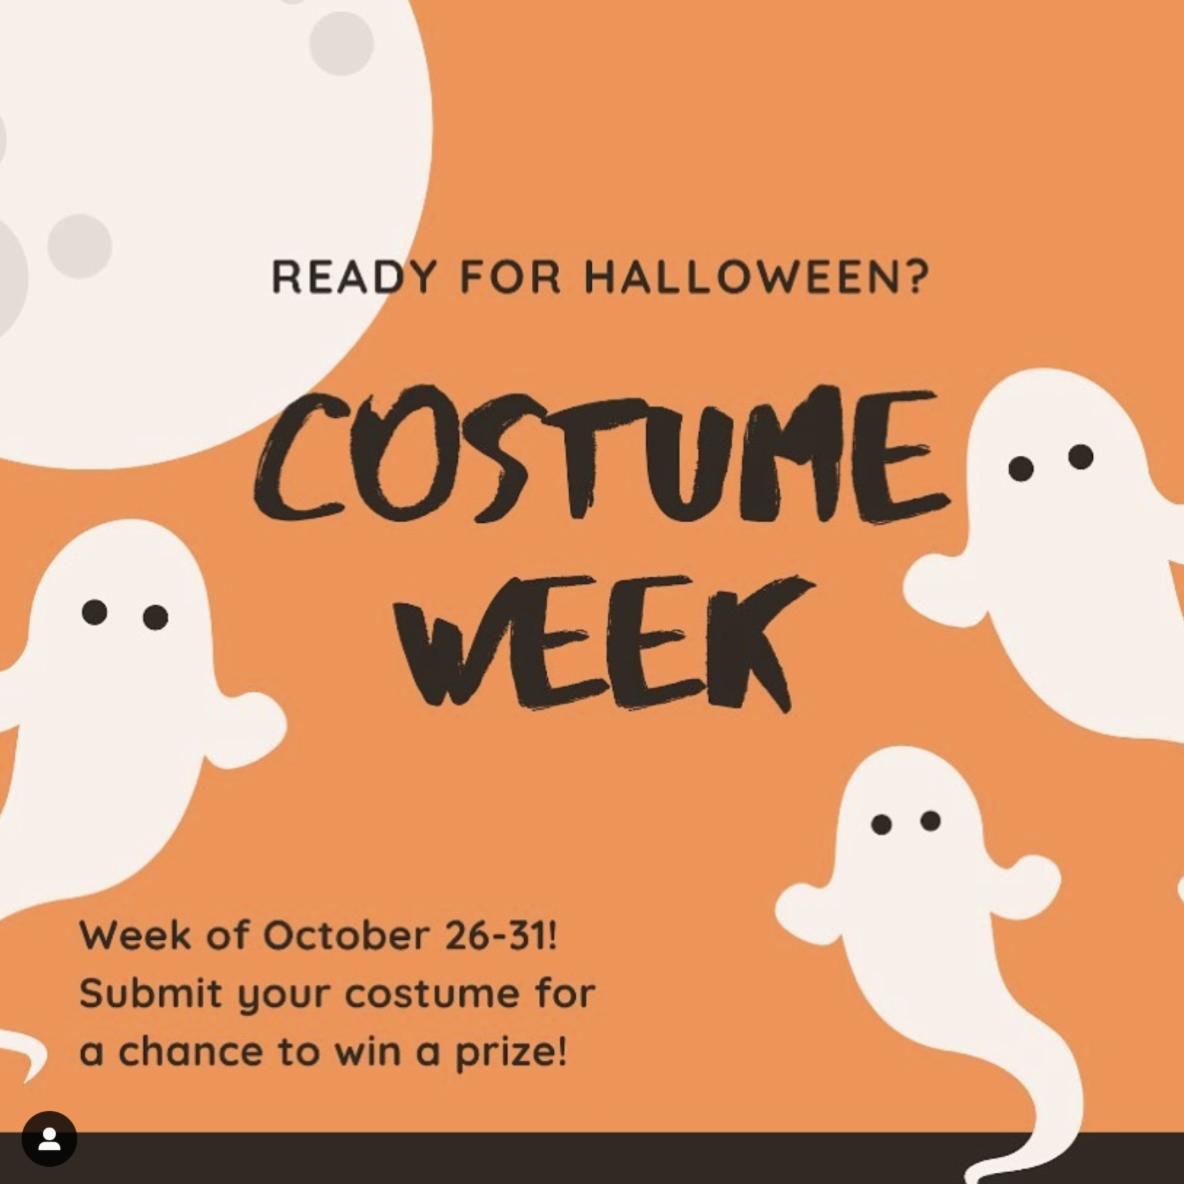 env council costume week